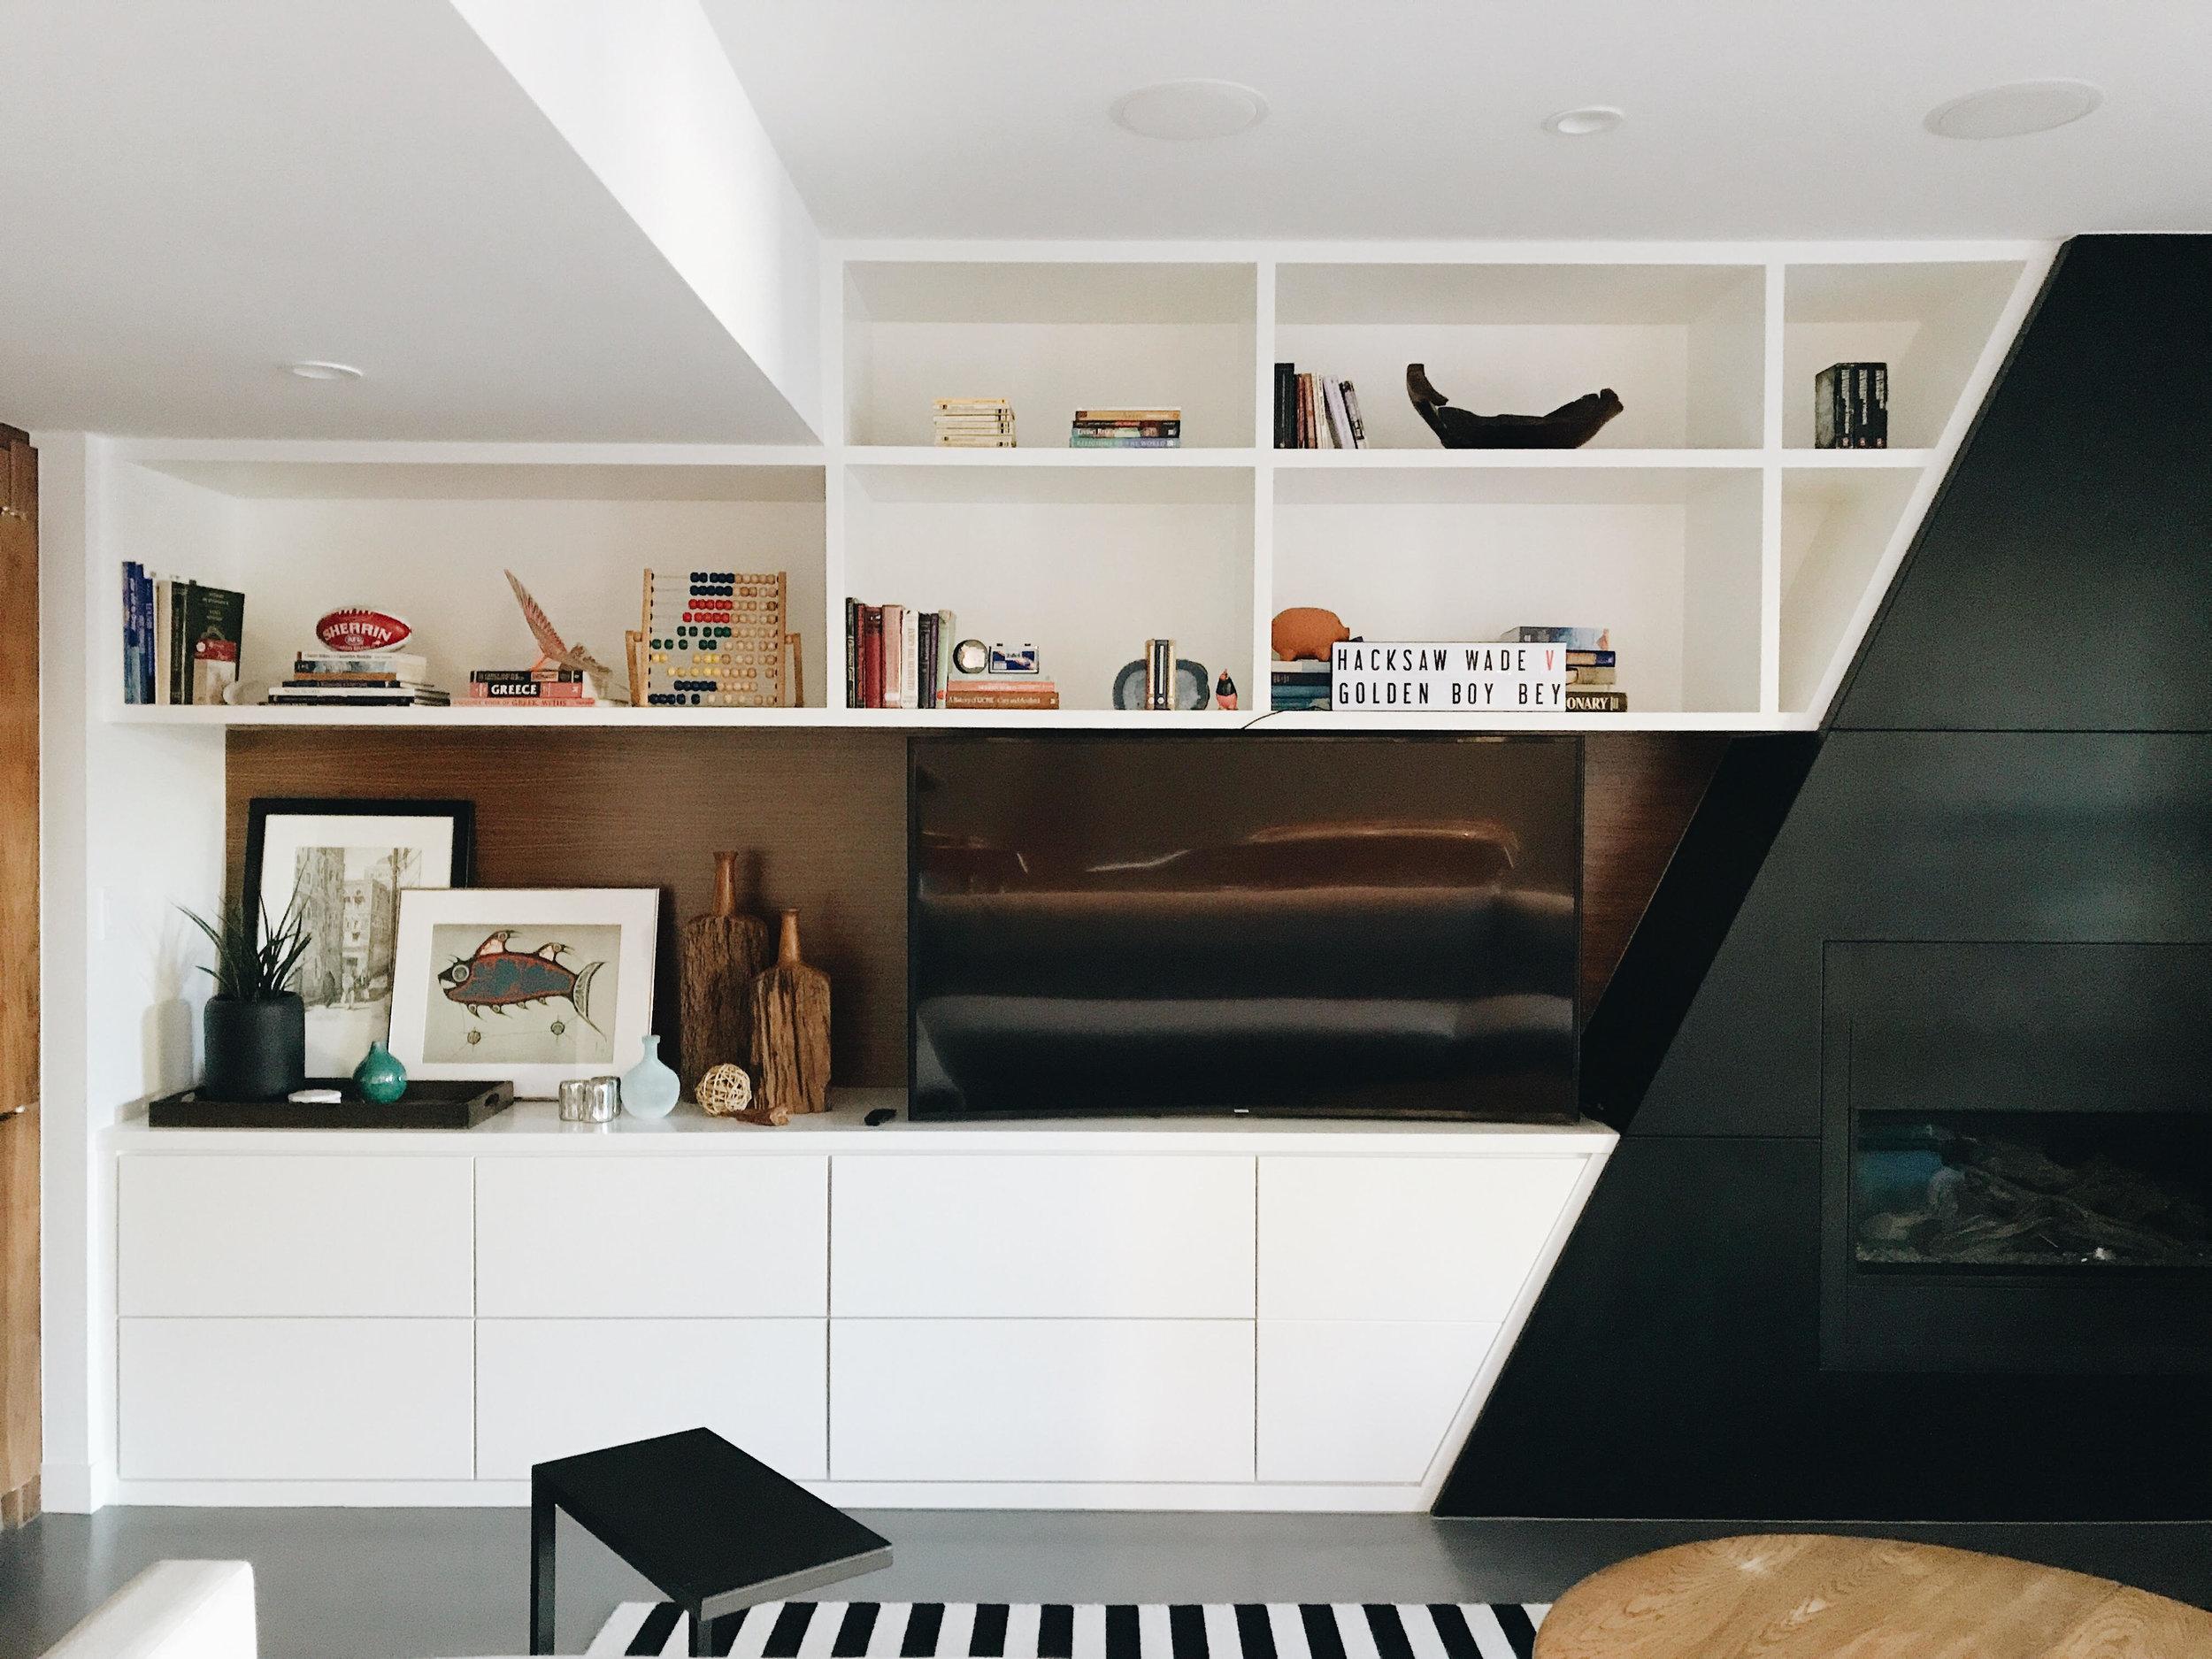 Bookshelf *before*, Nyla Free Designs Inc., Calgary Interior Designer, Before & After